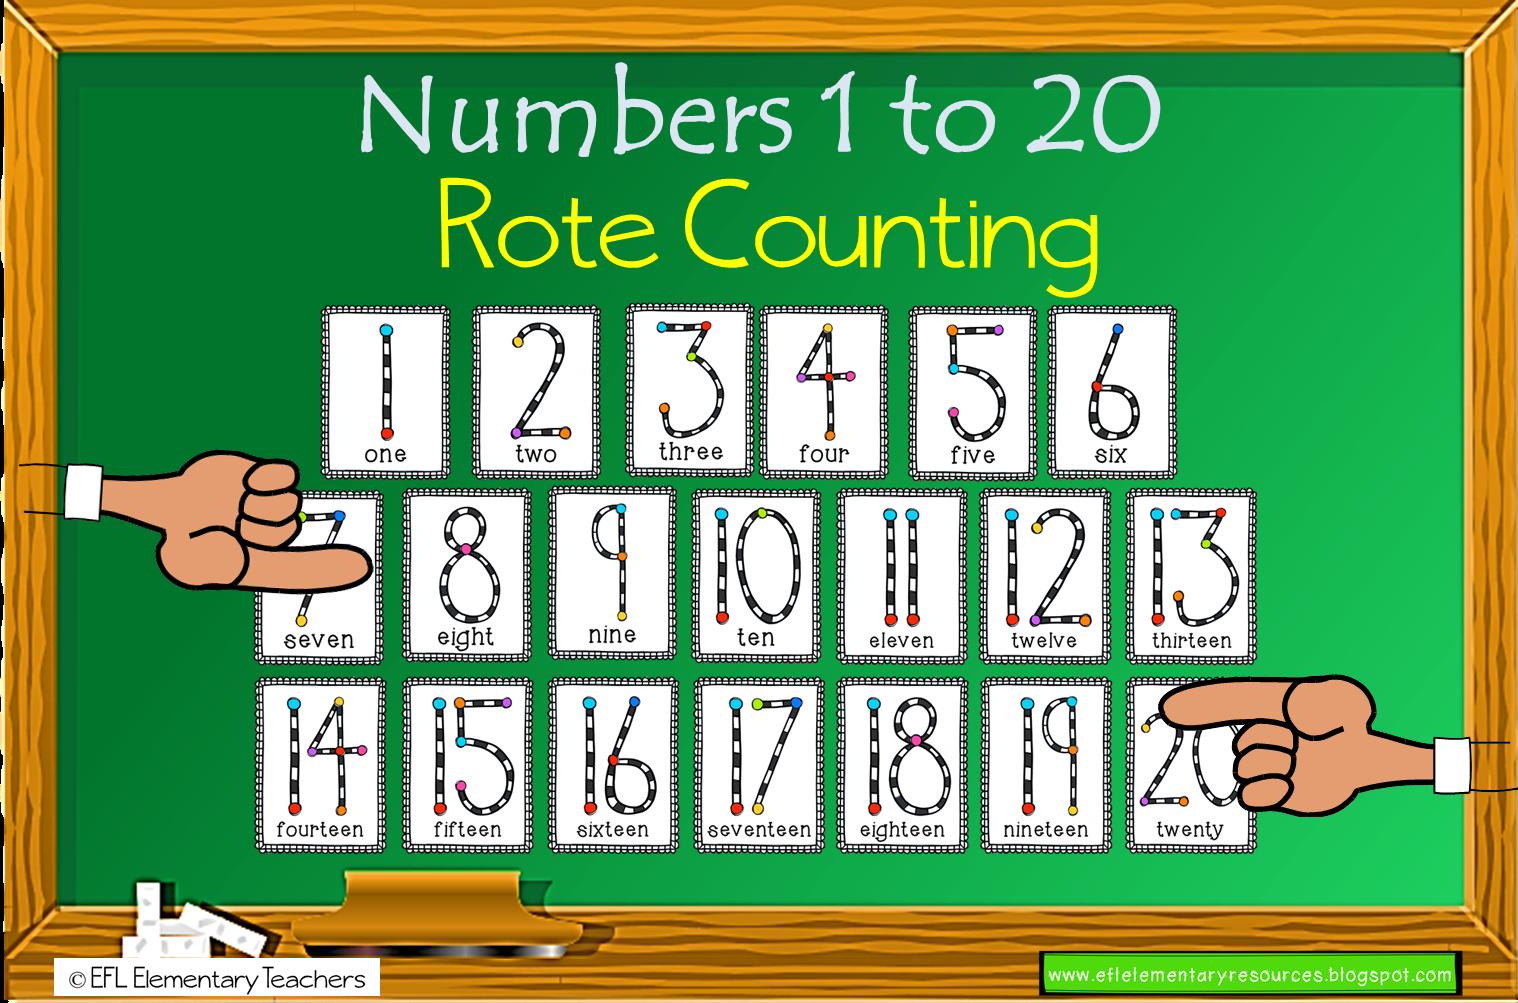 Efl Elementary Teachers Teaching Numbers 1 To 20 To Esl